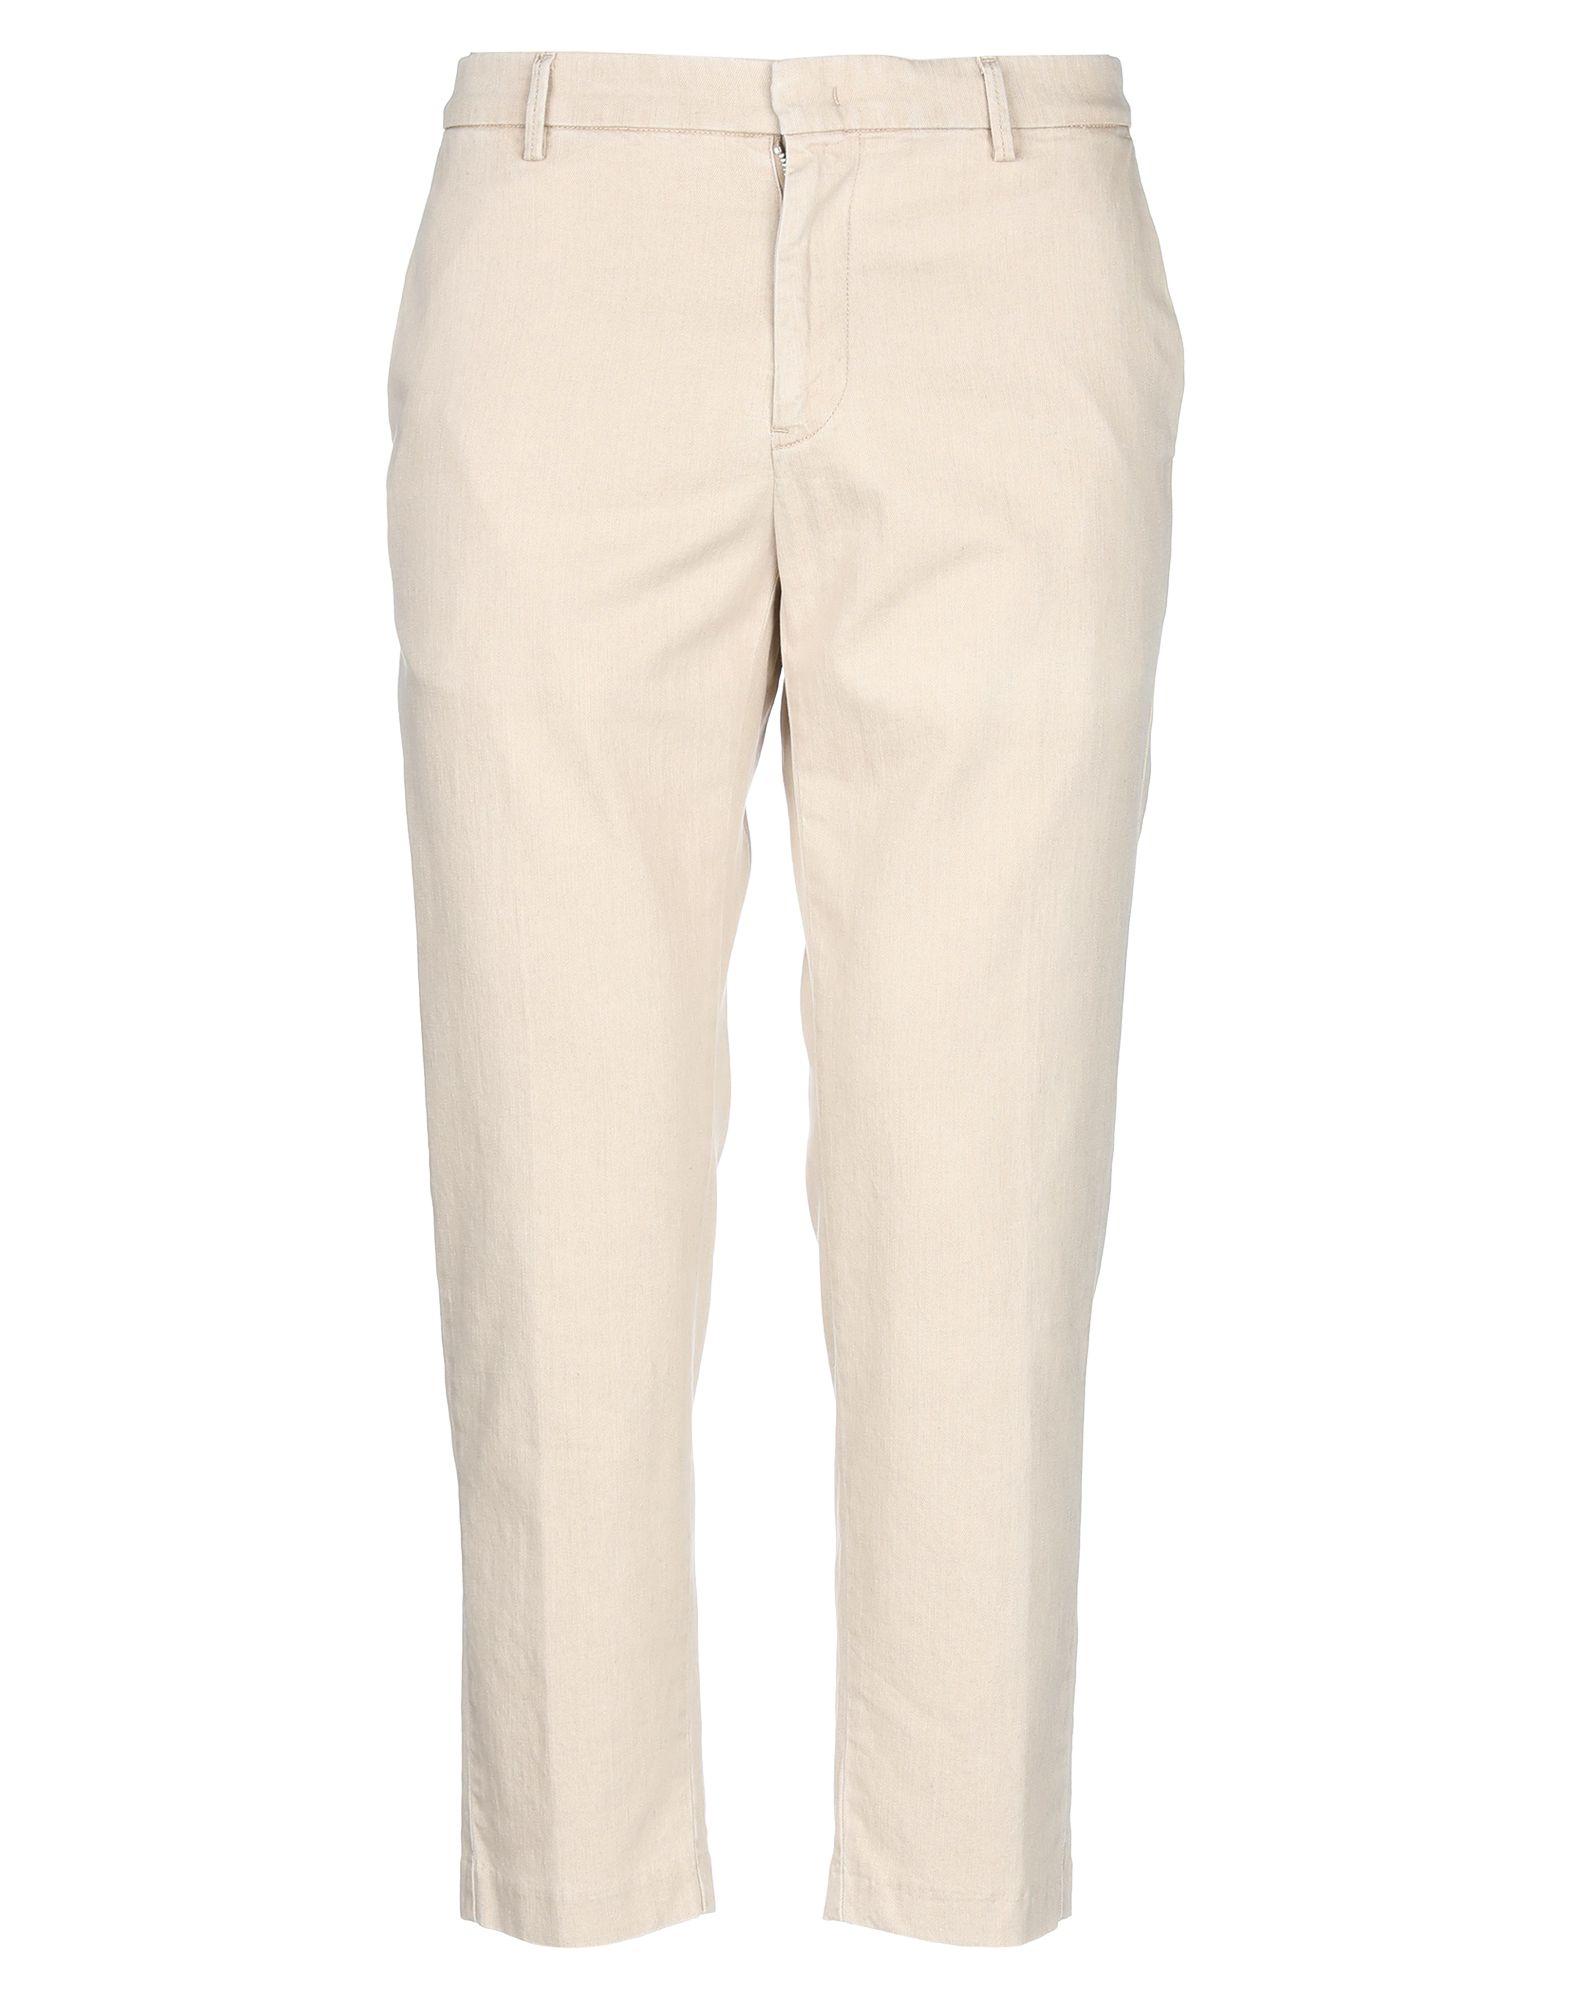 PAOLO PECORA Повседневные брюки paolo casalini пиджак